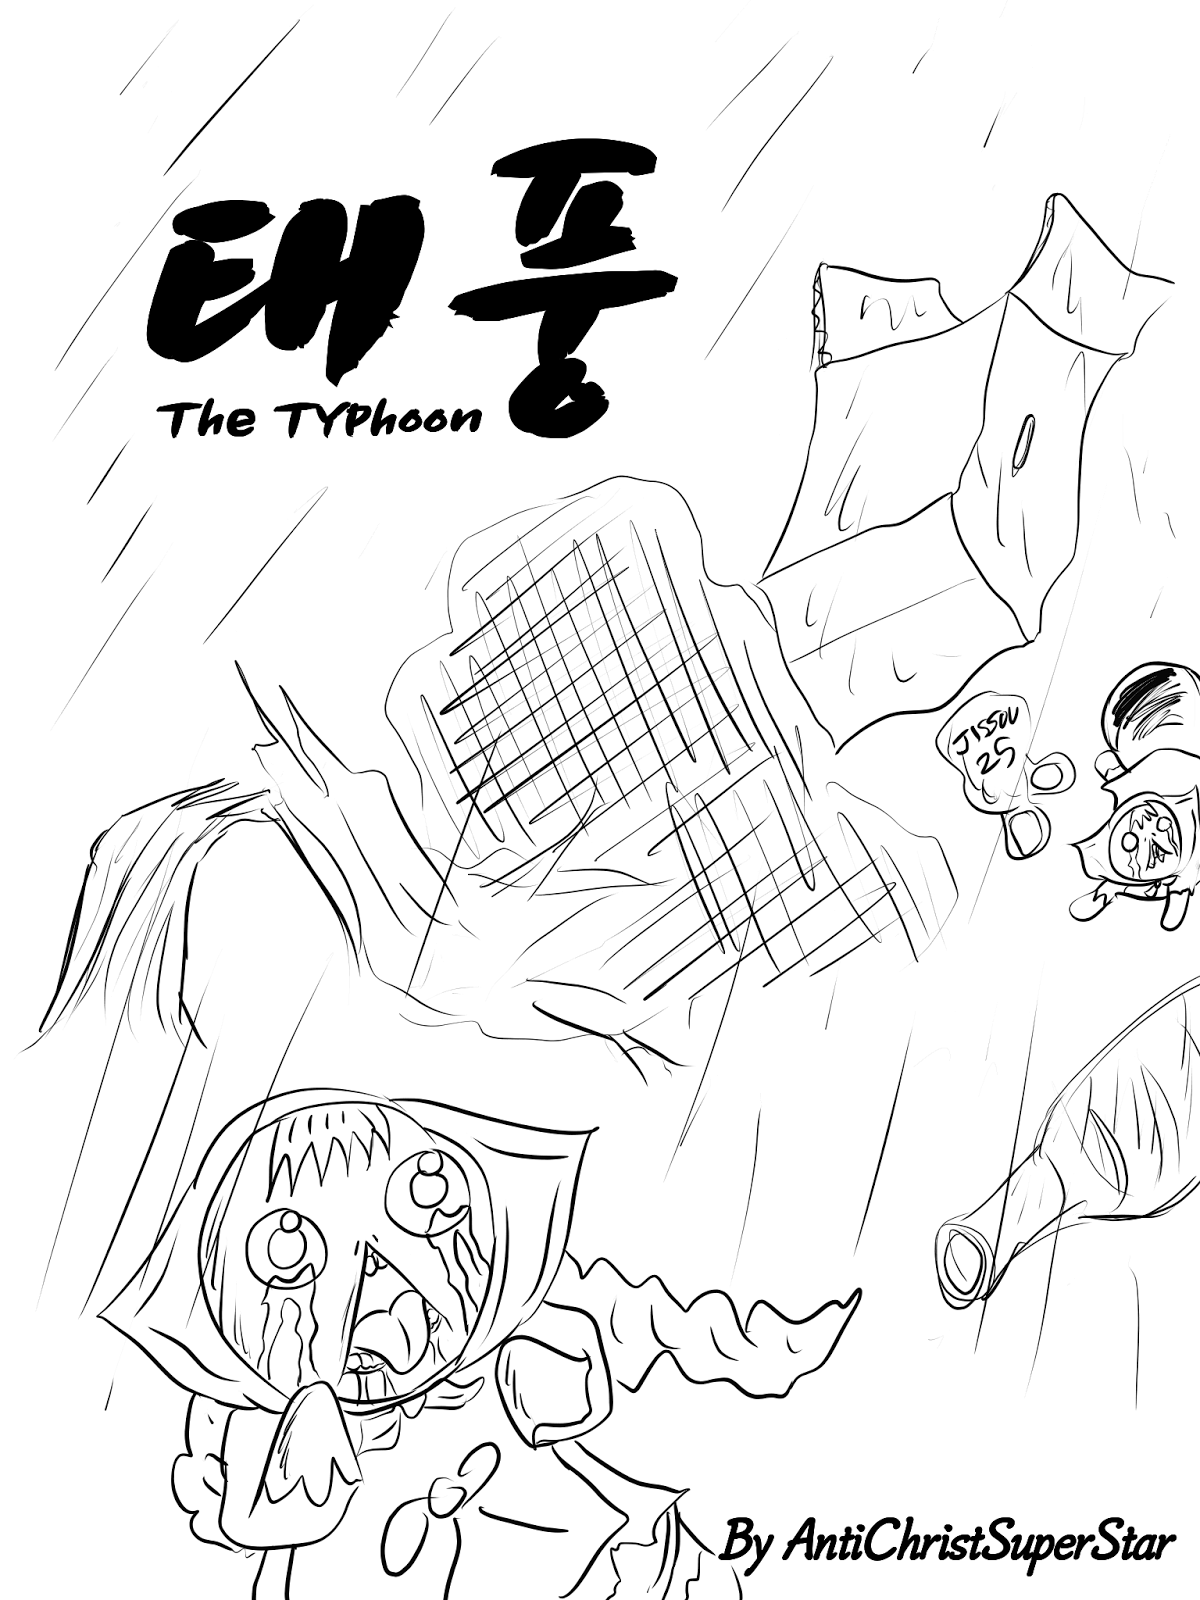 Typhoon00.png